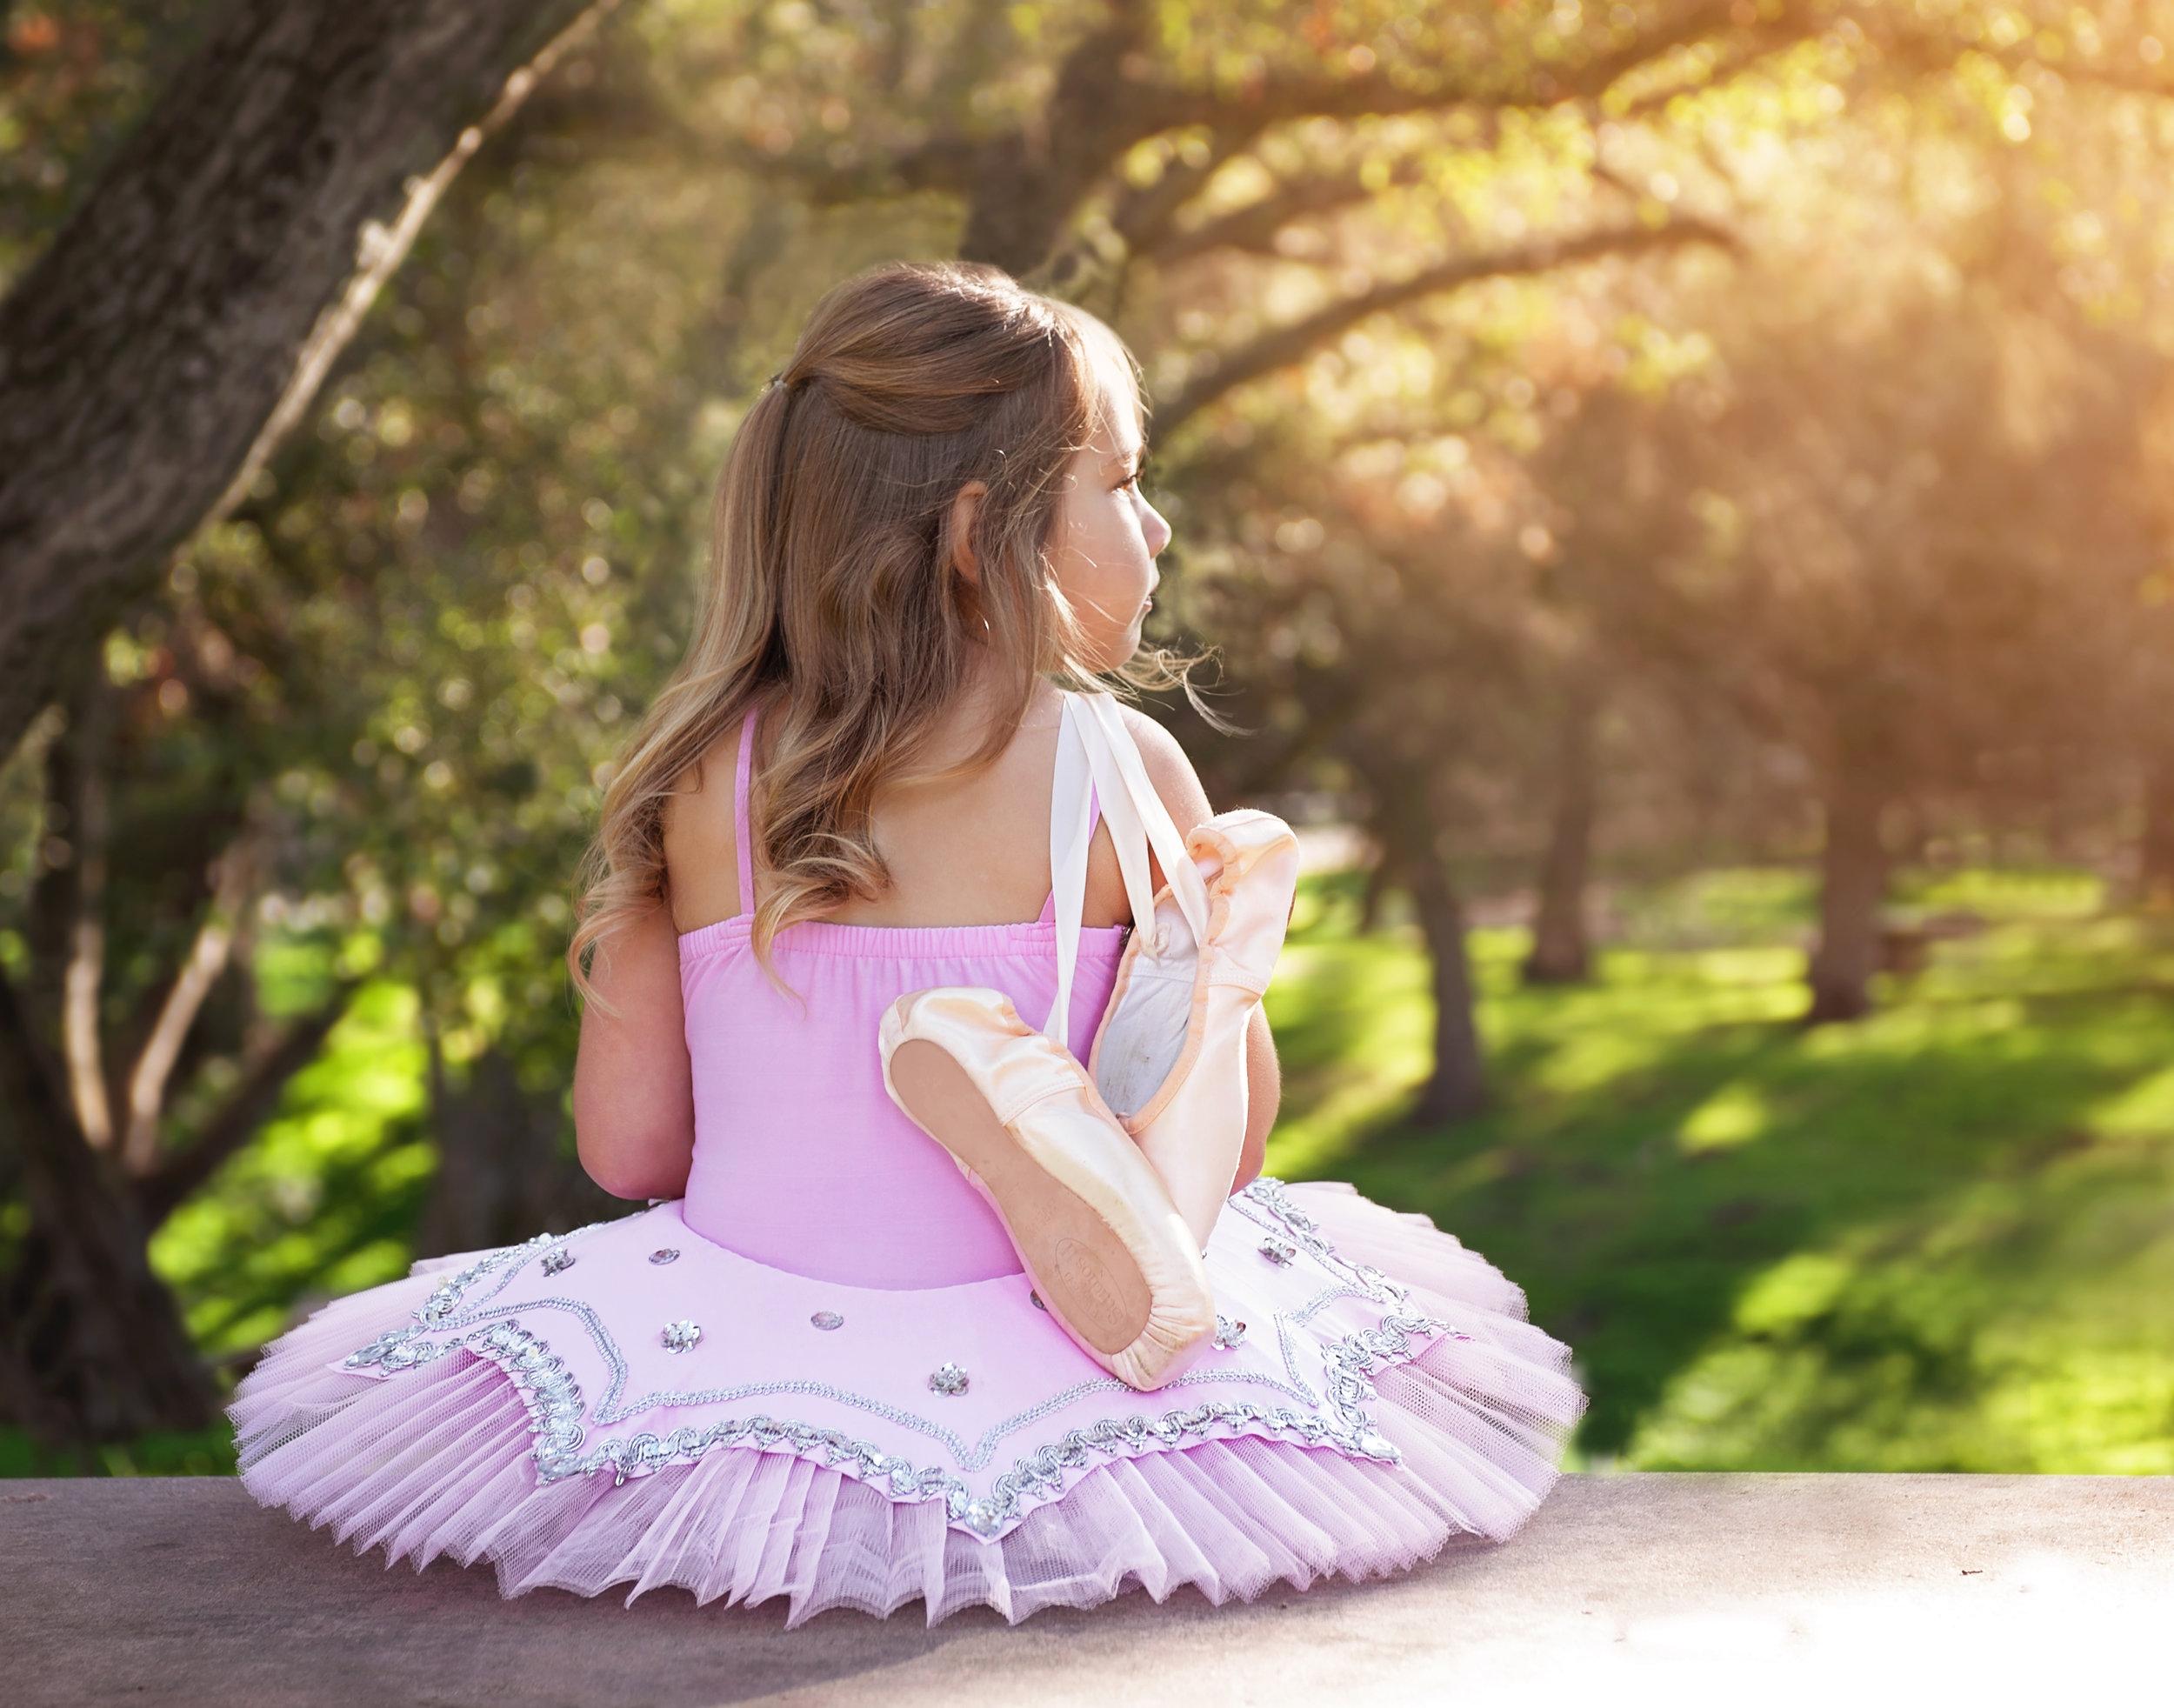 ballerina-outdoor-fallbrook-bonsall-park-school-photography-photographer